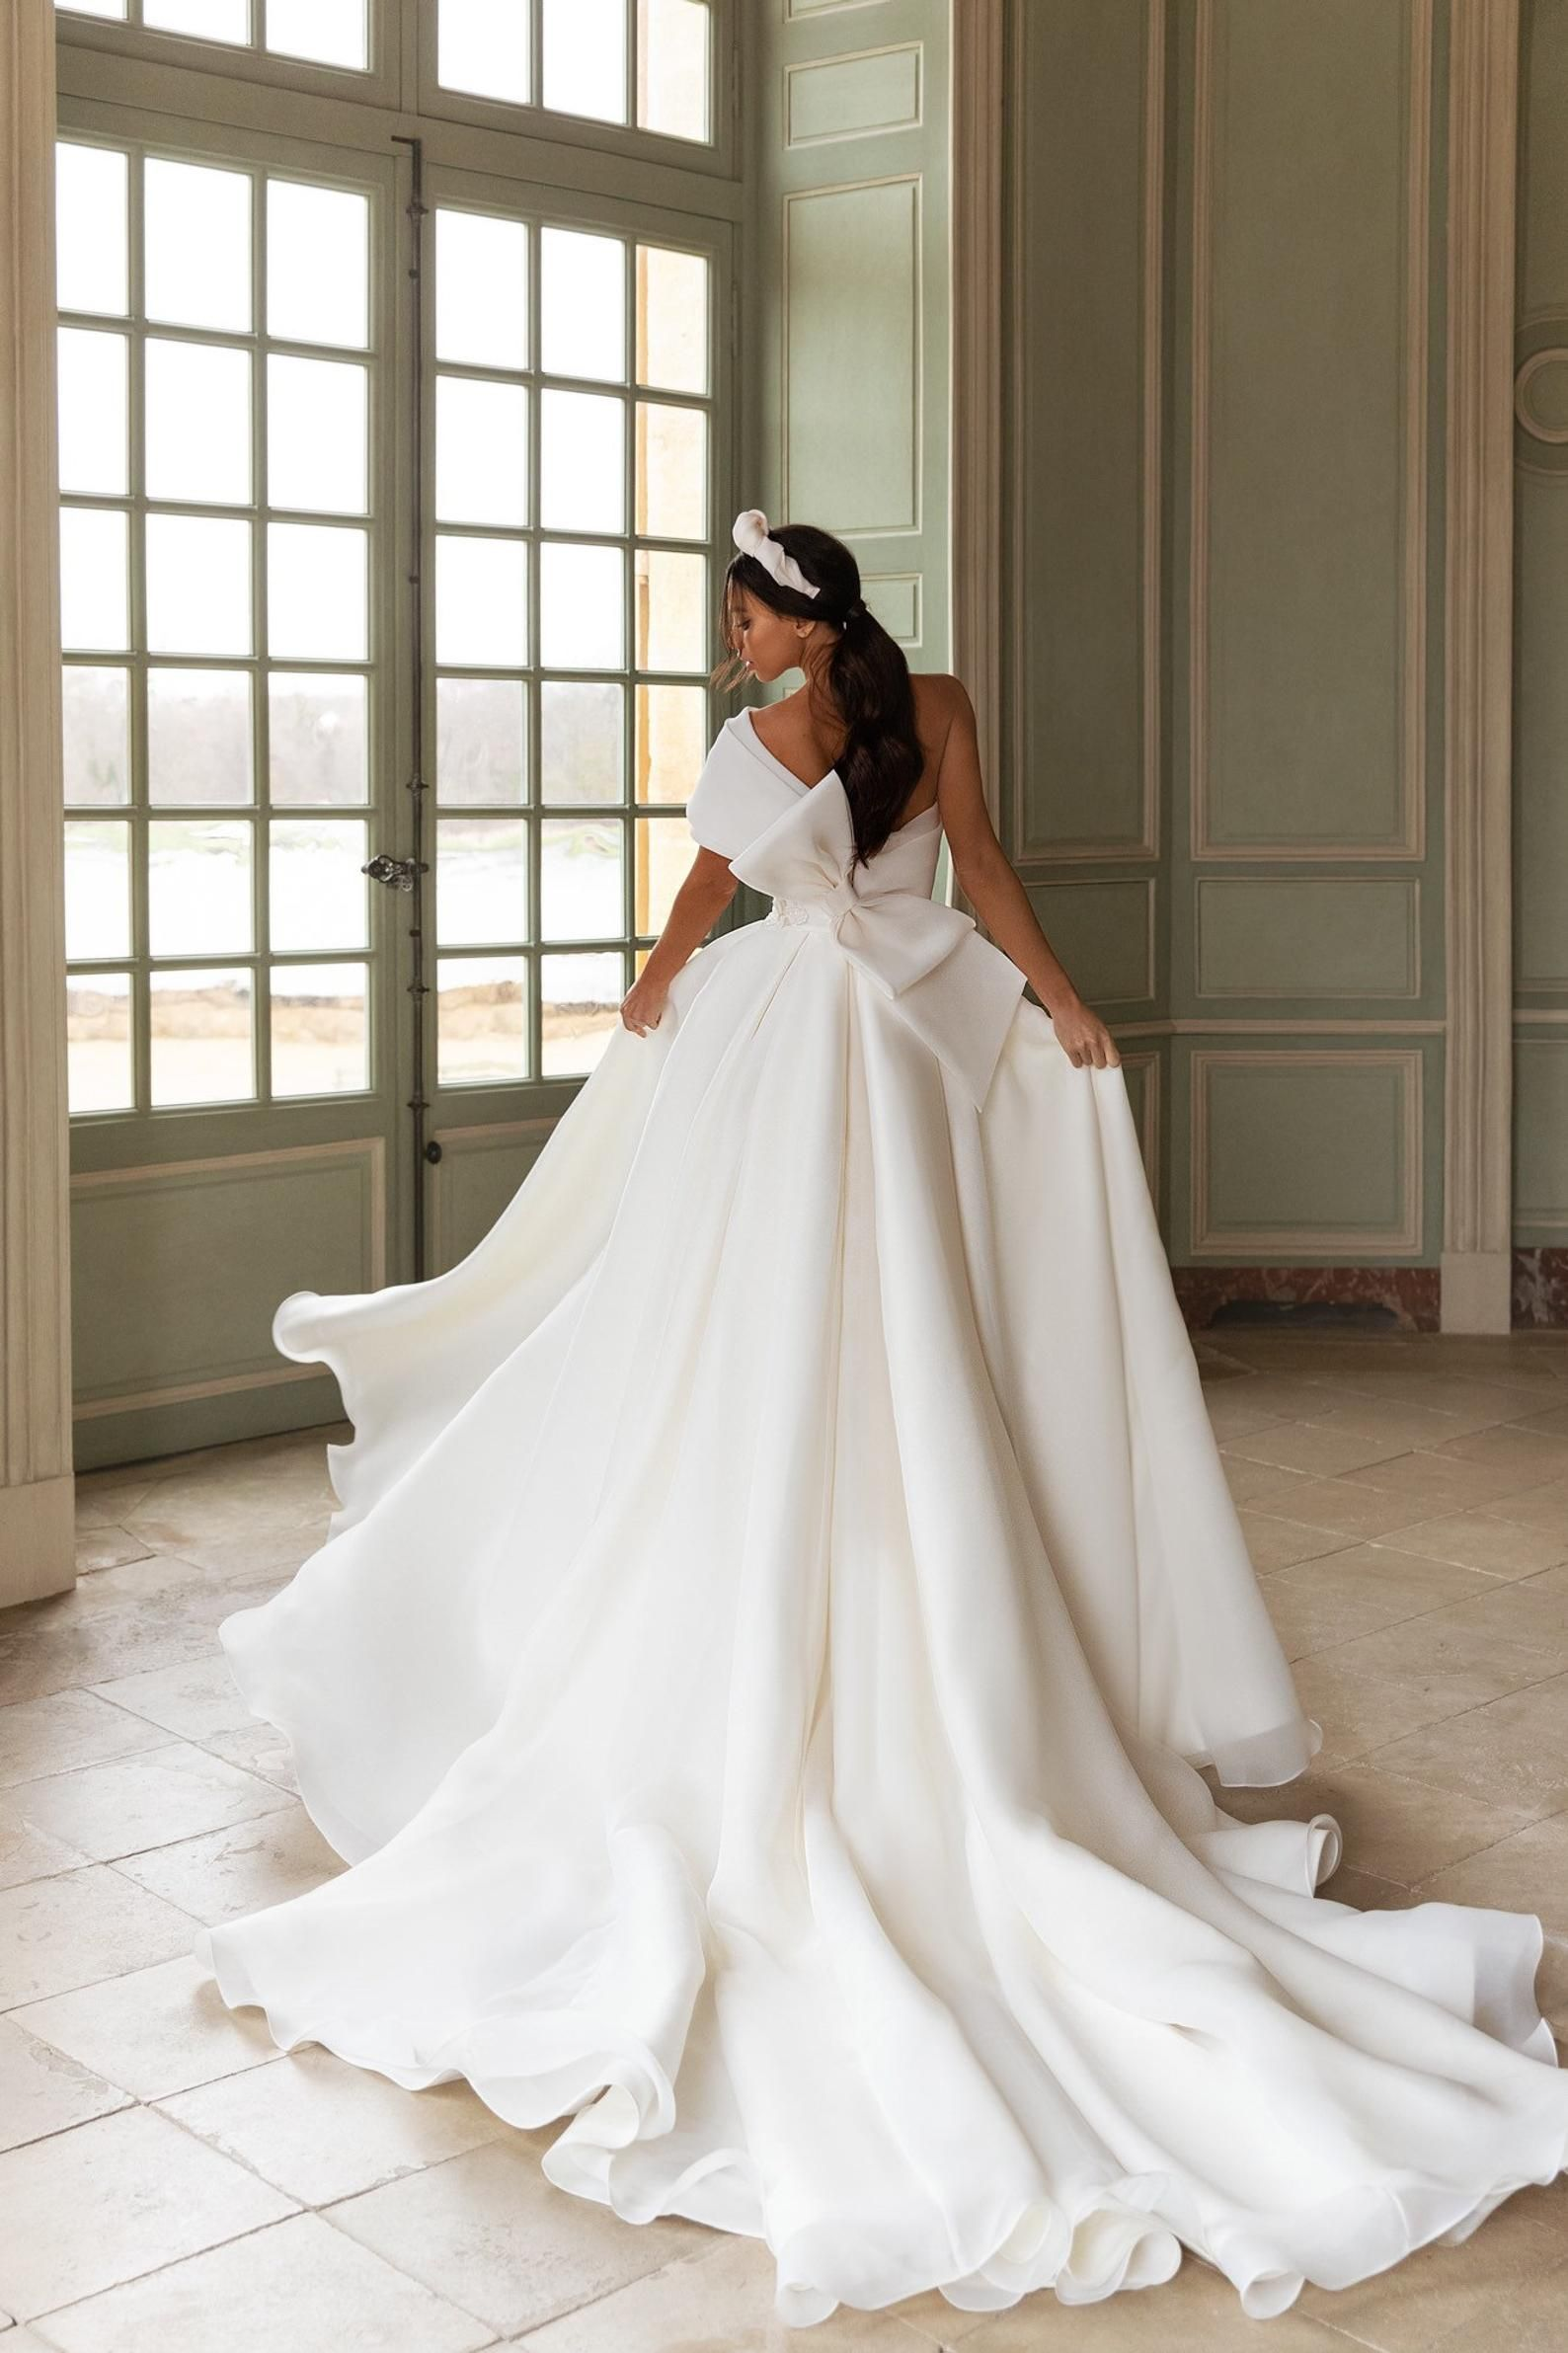 Romantic Wedding Dress Bridal Dresses And Separates White Wedding Dress Elegant Bridal Gown Royal Wedding Dress In 2020 Elegant Bridal Gown Royal Wedding Dress Bow Wedding Dress